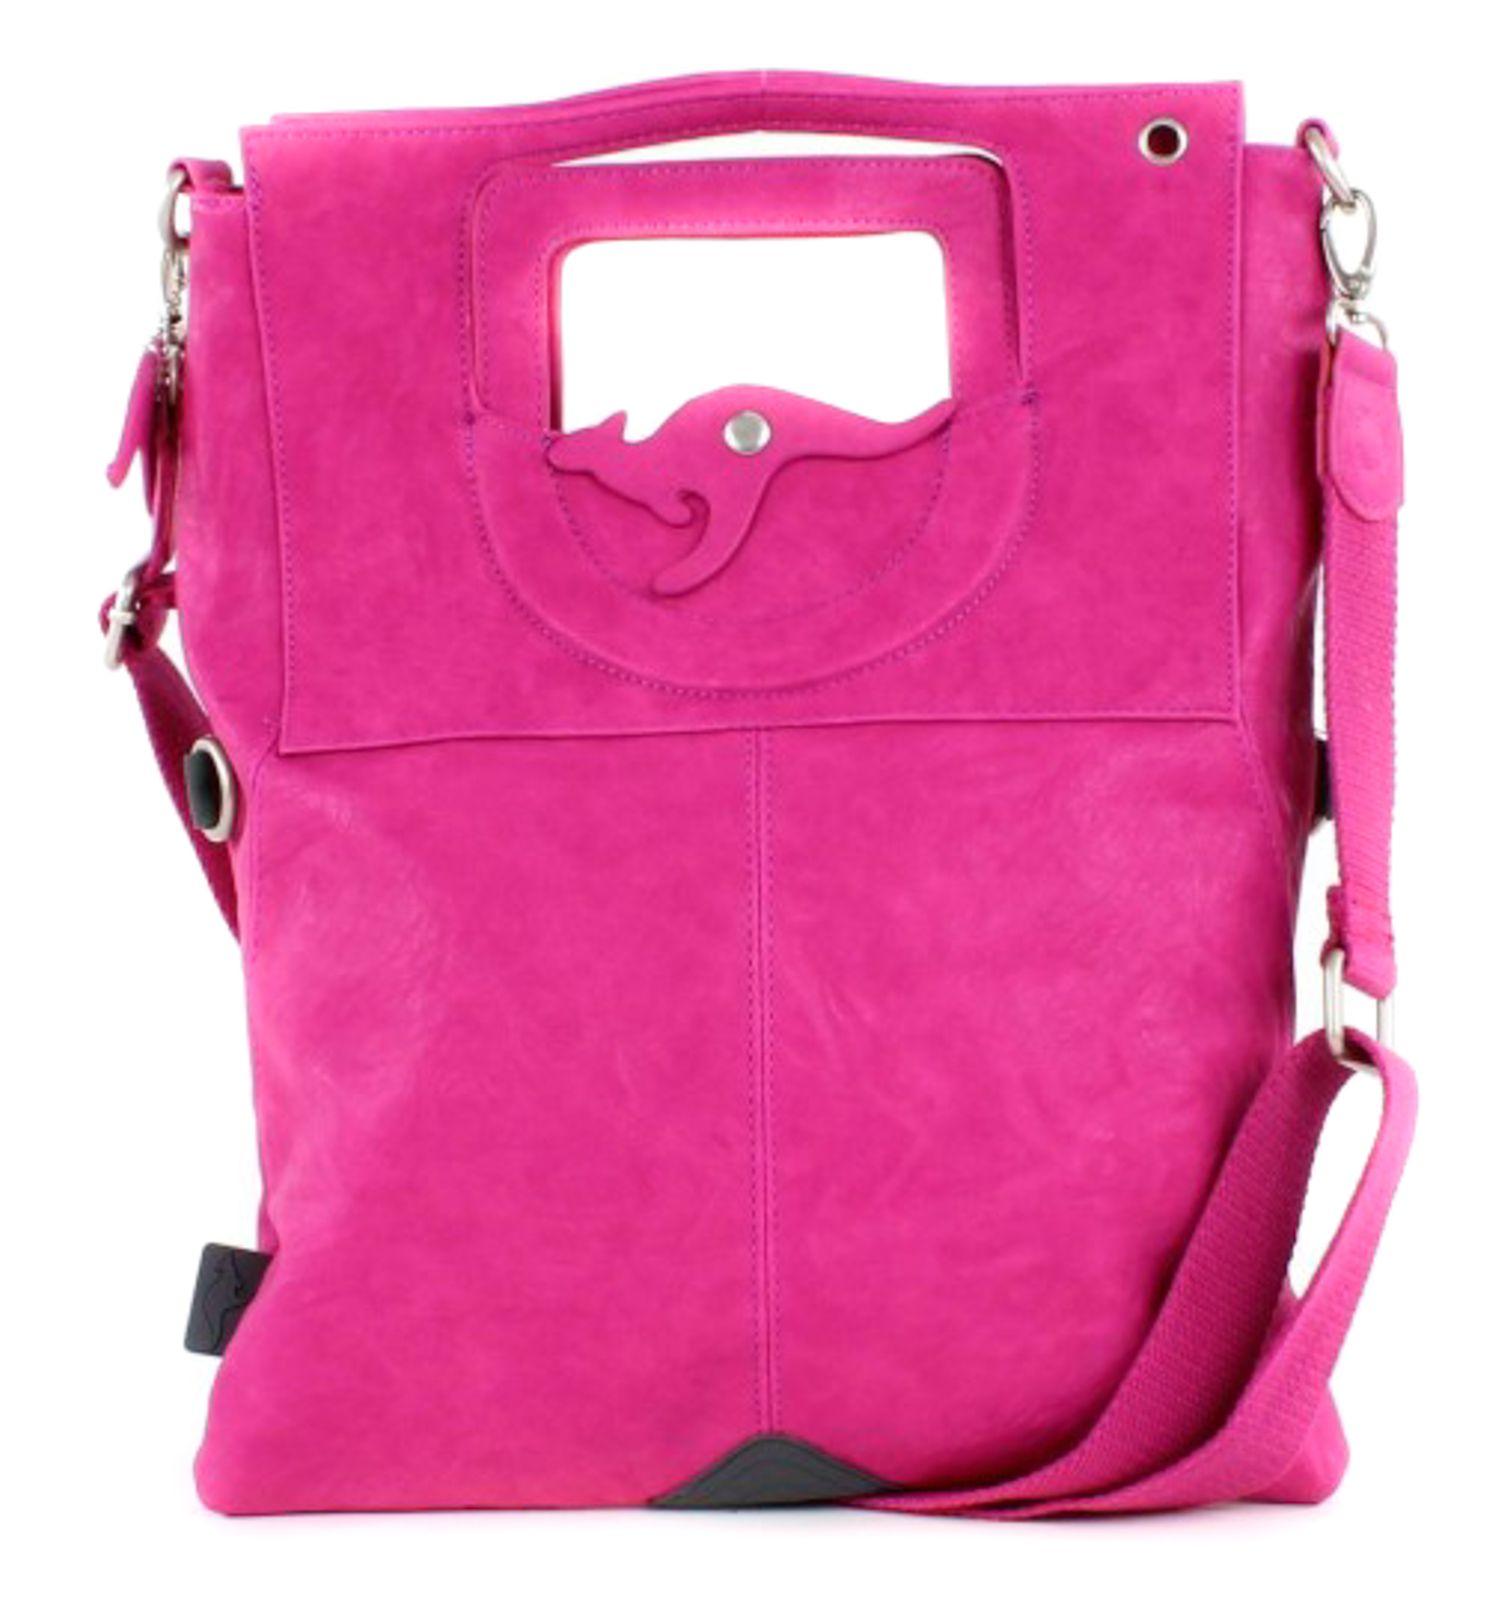 KangaROOS Jean Cliffhanger Bag (Set) Lilli Pilli